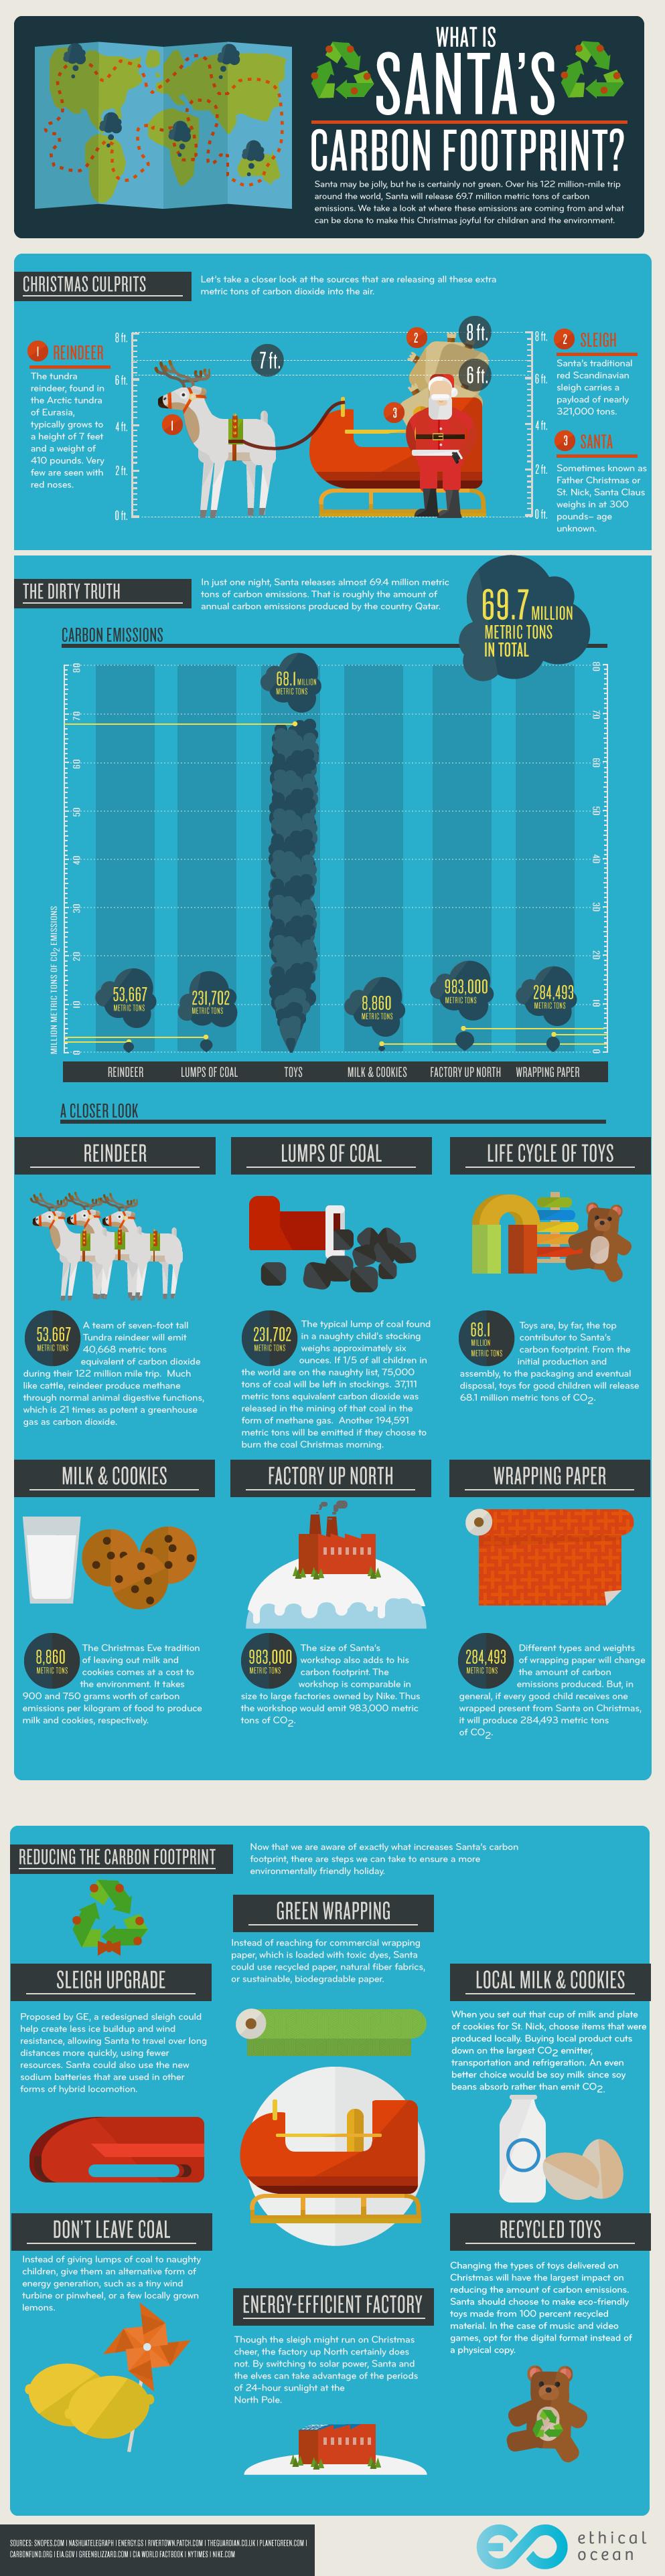 carbon-footprint-santa-infographic